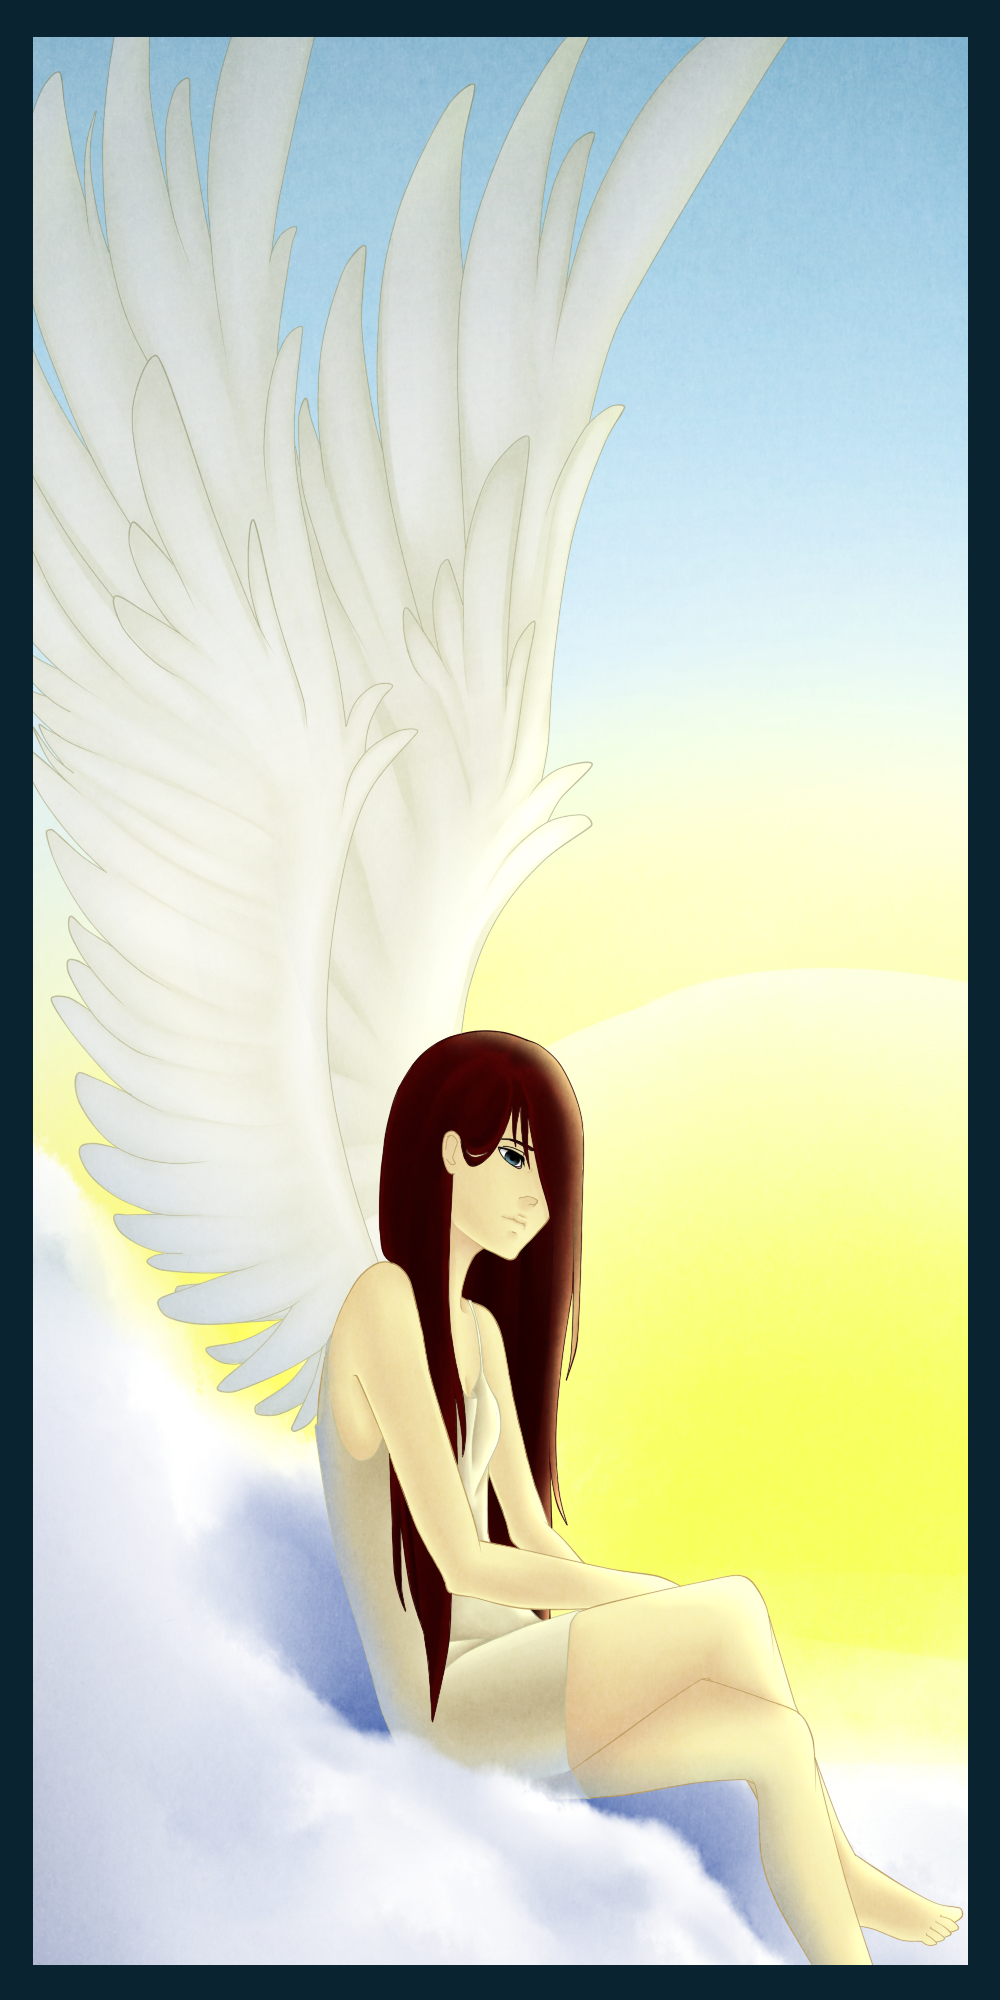 ANGEL (close-up)